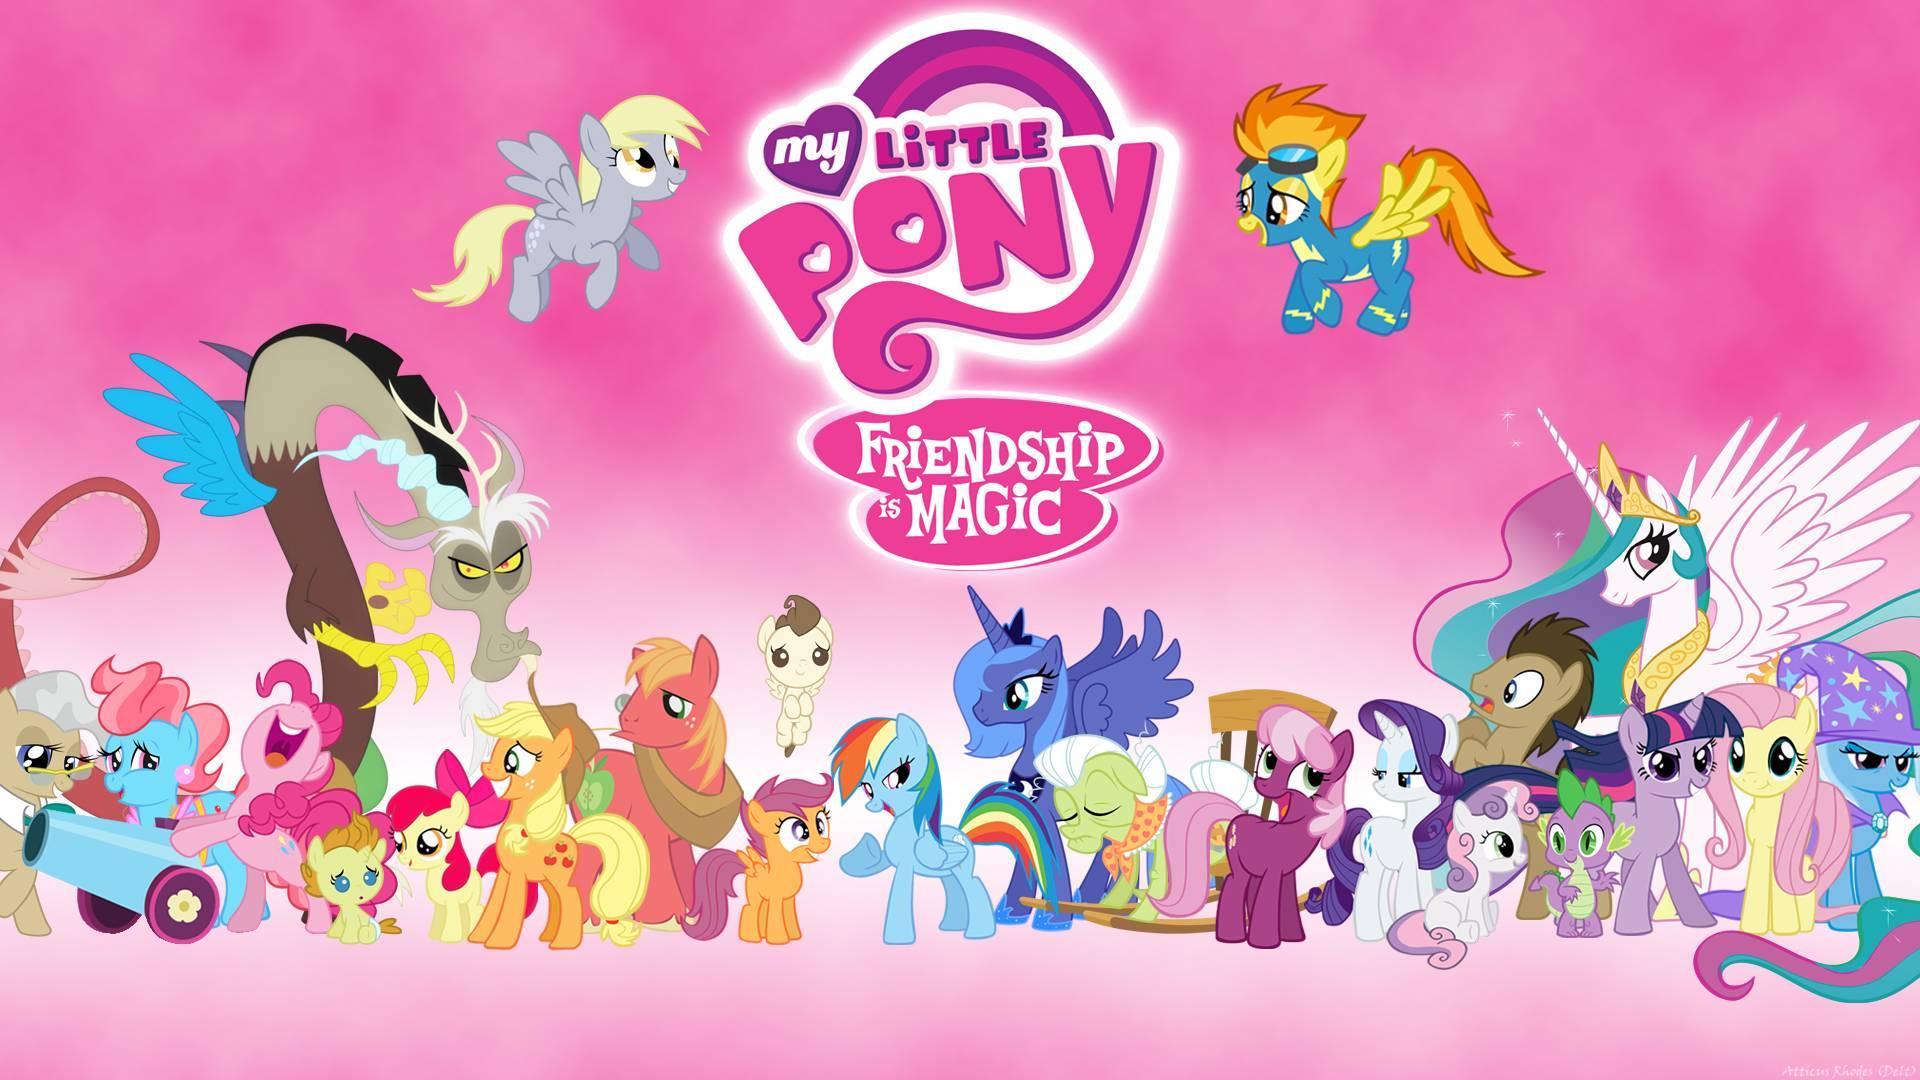 MLPFIM Wallpaper   My Little Pony Friendship is Magic Wallpaper 1920x1080